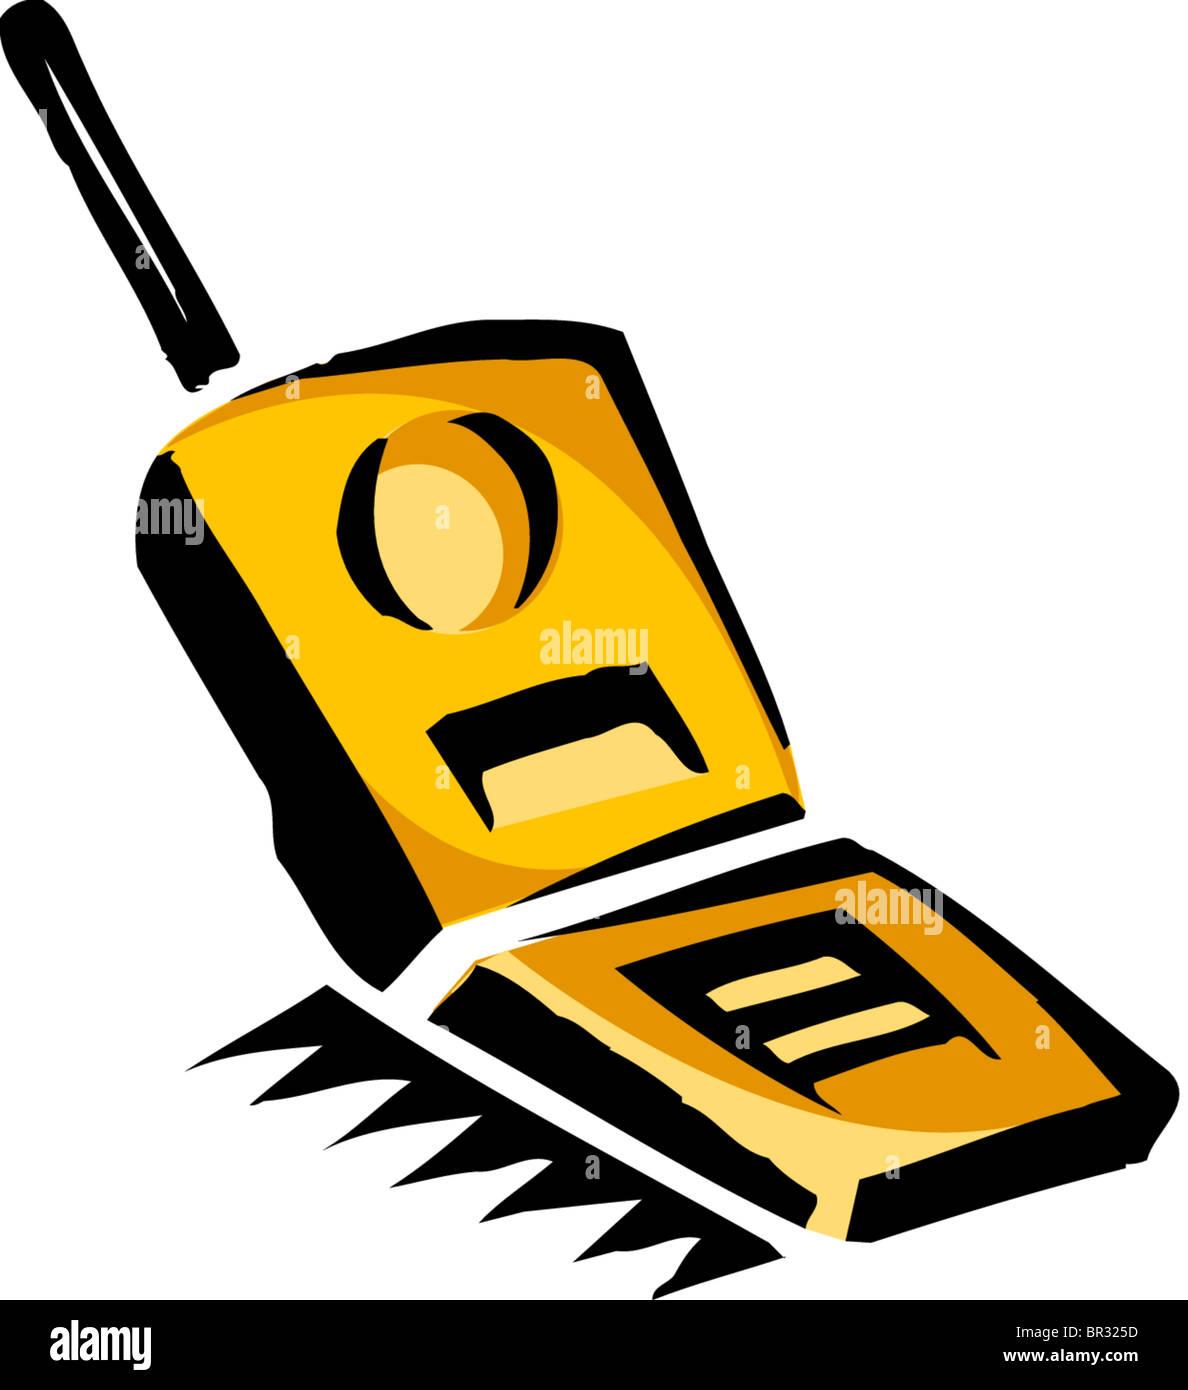 Un Dibujo De Un Teléfono Con Tapa Foto Imagen De Stock 31415033